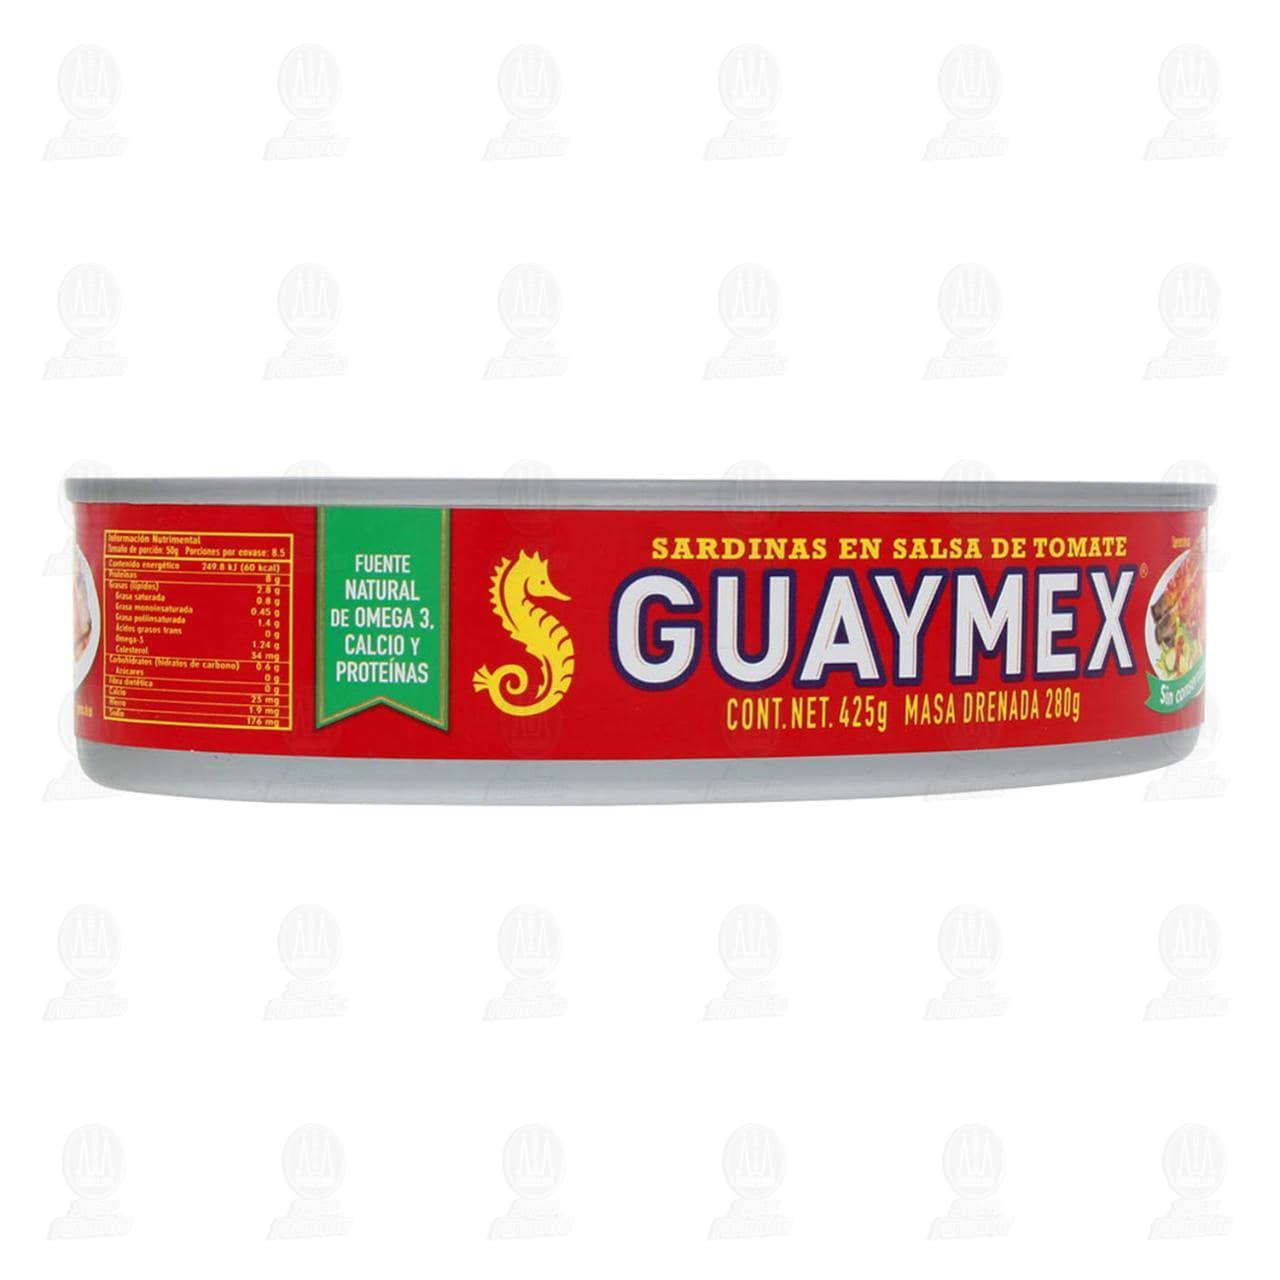 Sardinas Guaymex en Salsa de Tomate, 425 gr.